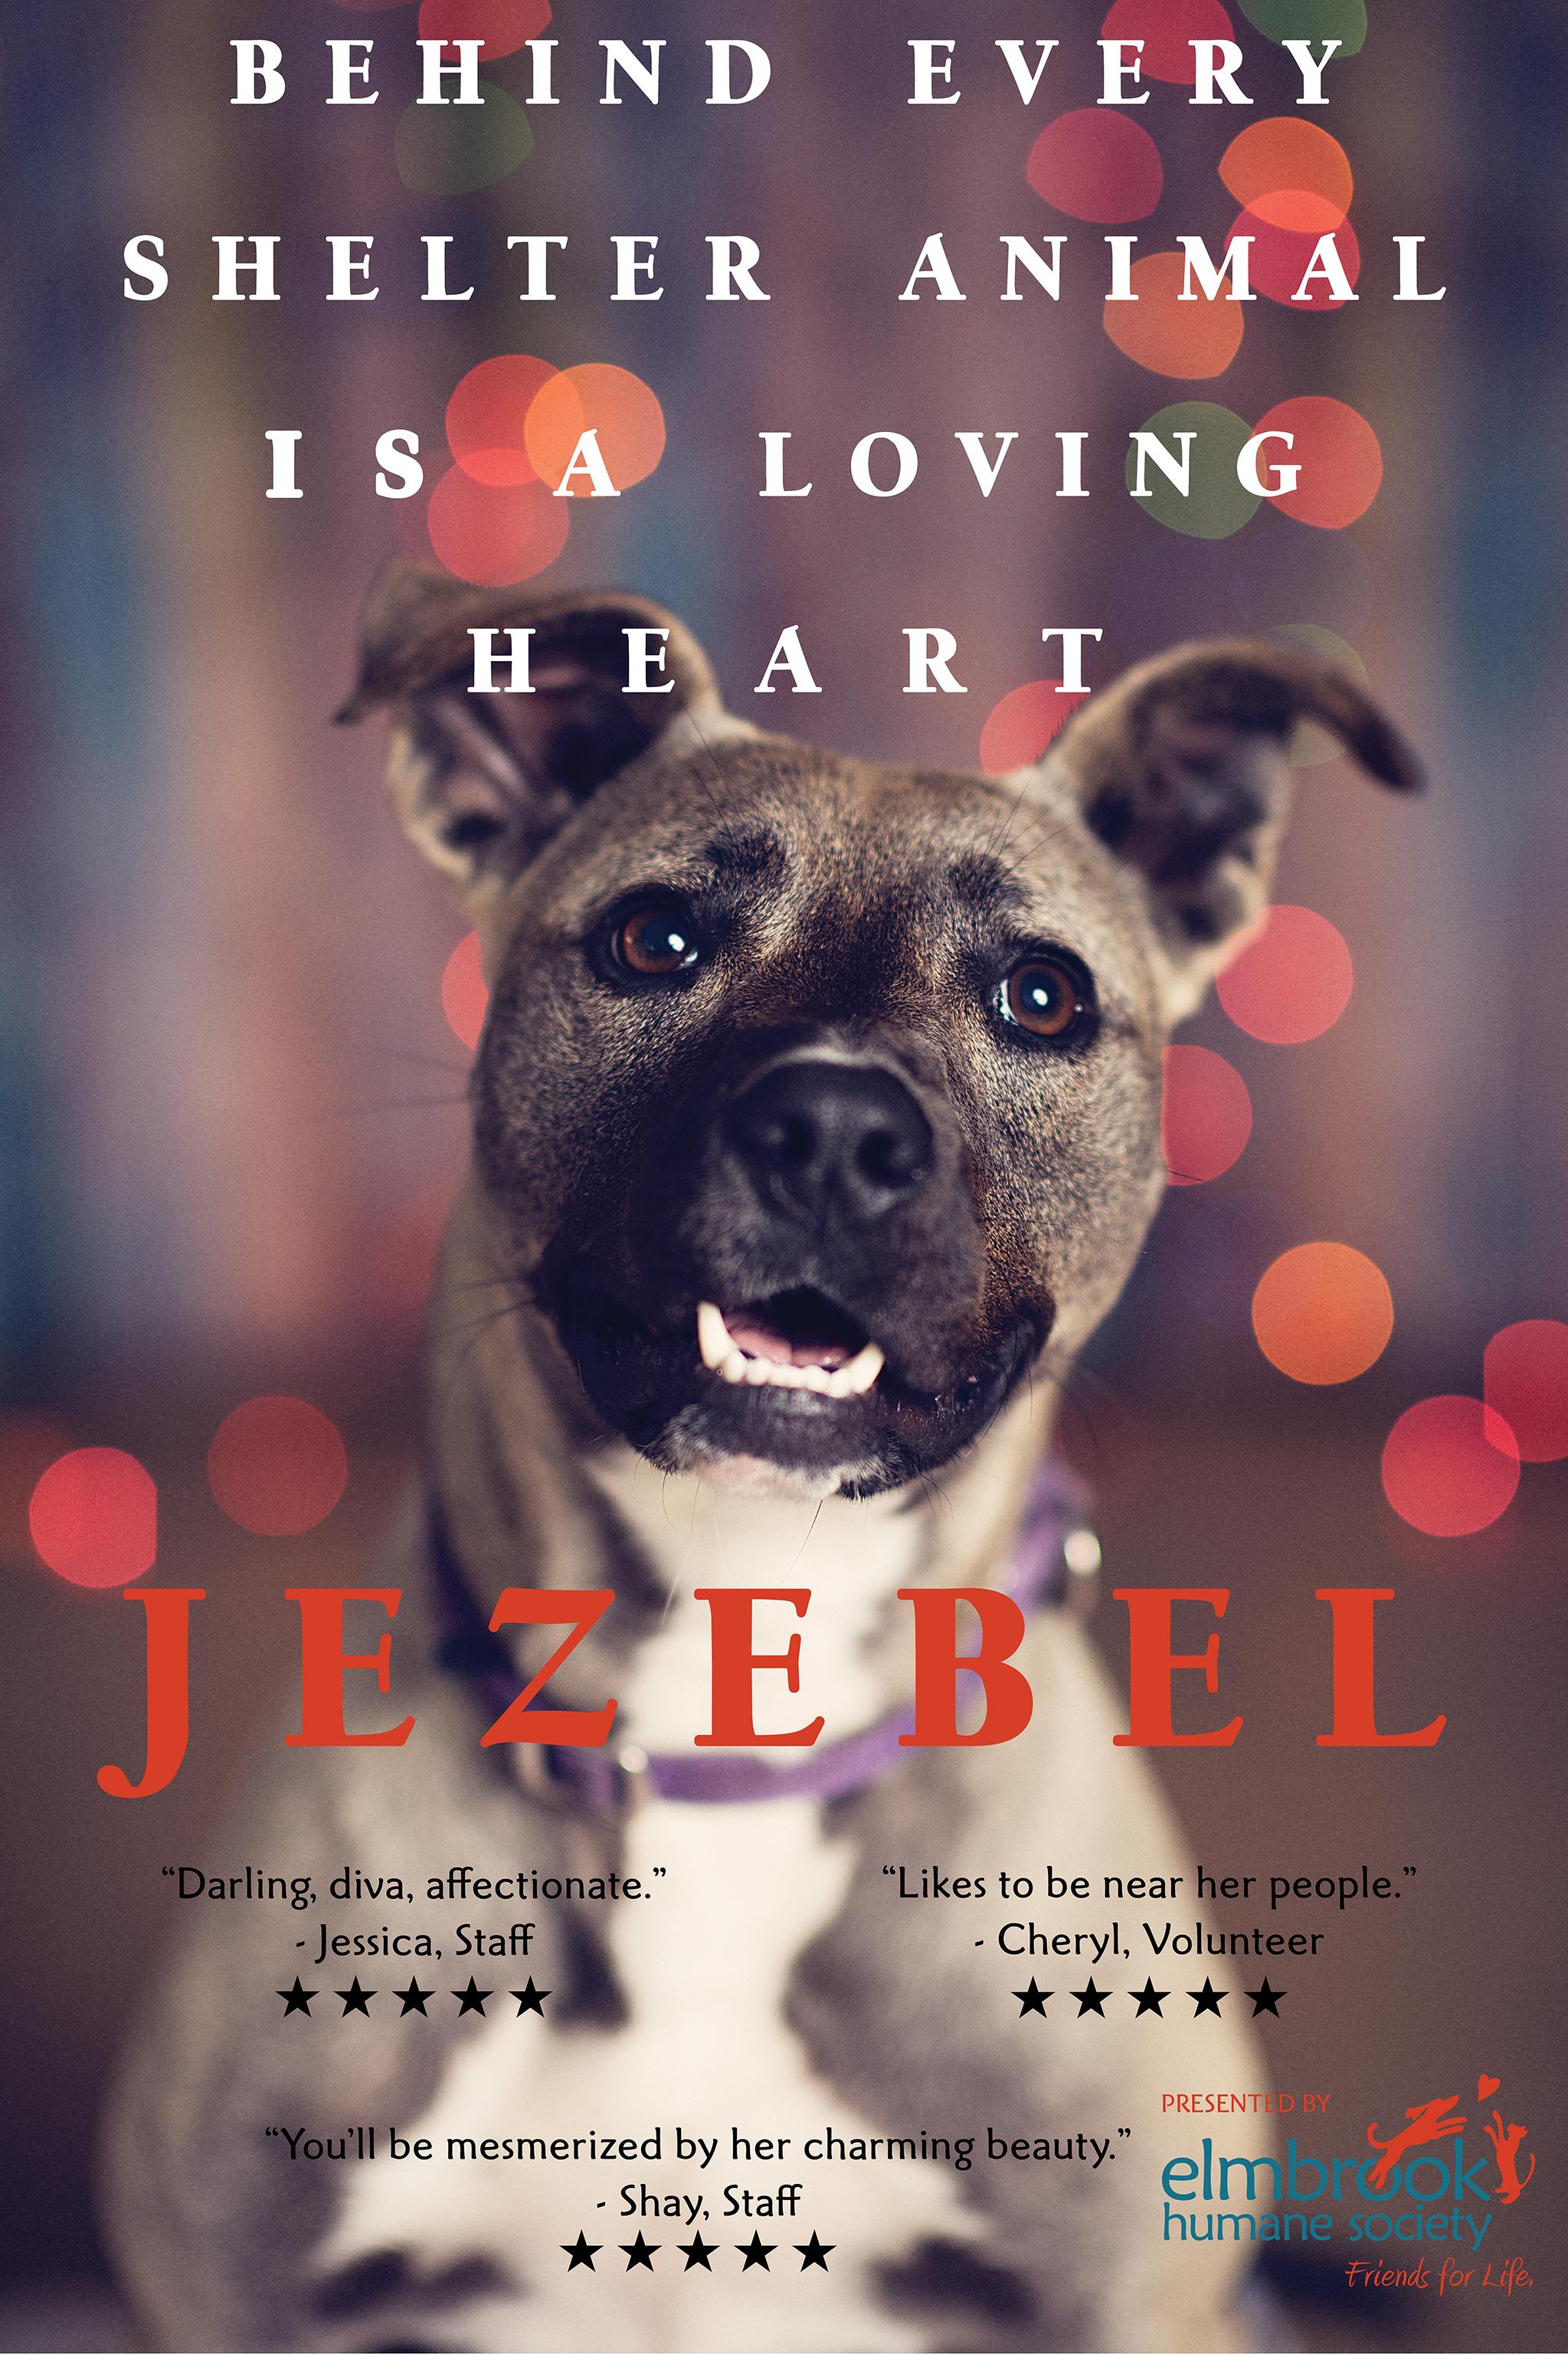 JezebelPoster_ErinBeckett_2019-06-12.jpg